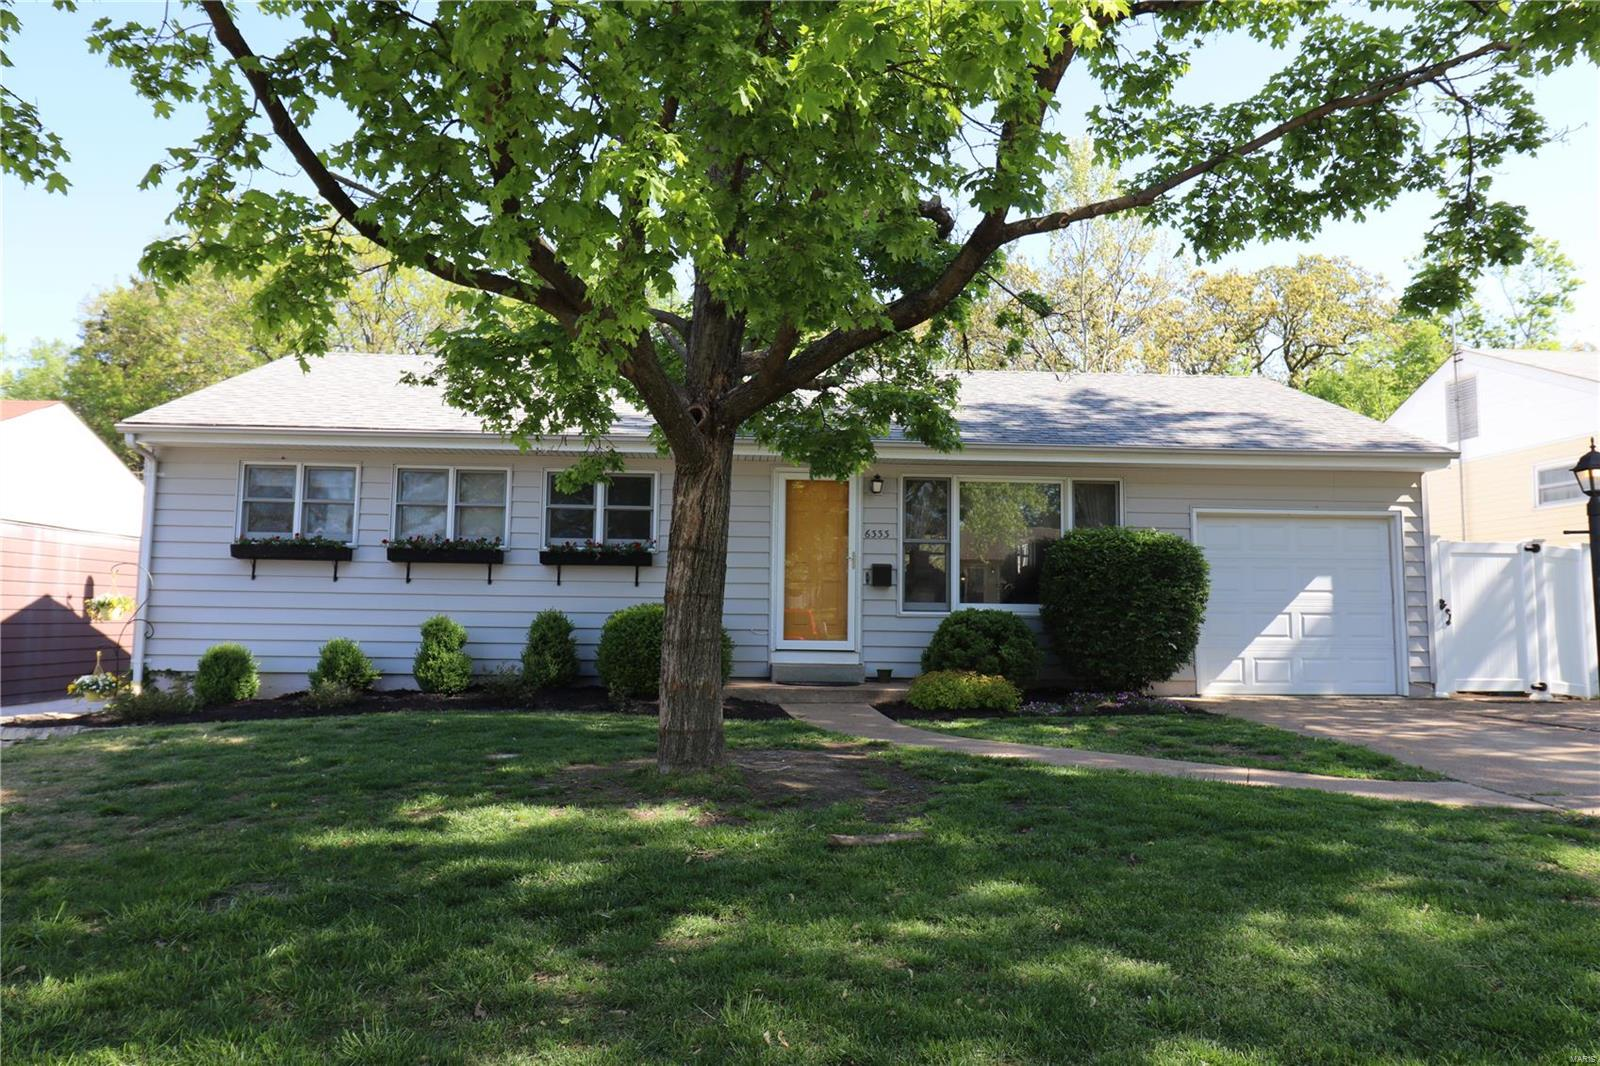 6333 Hurstgreen Lane Property Photo - Affton, MO real estate listing